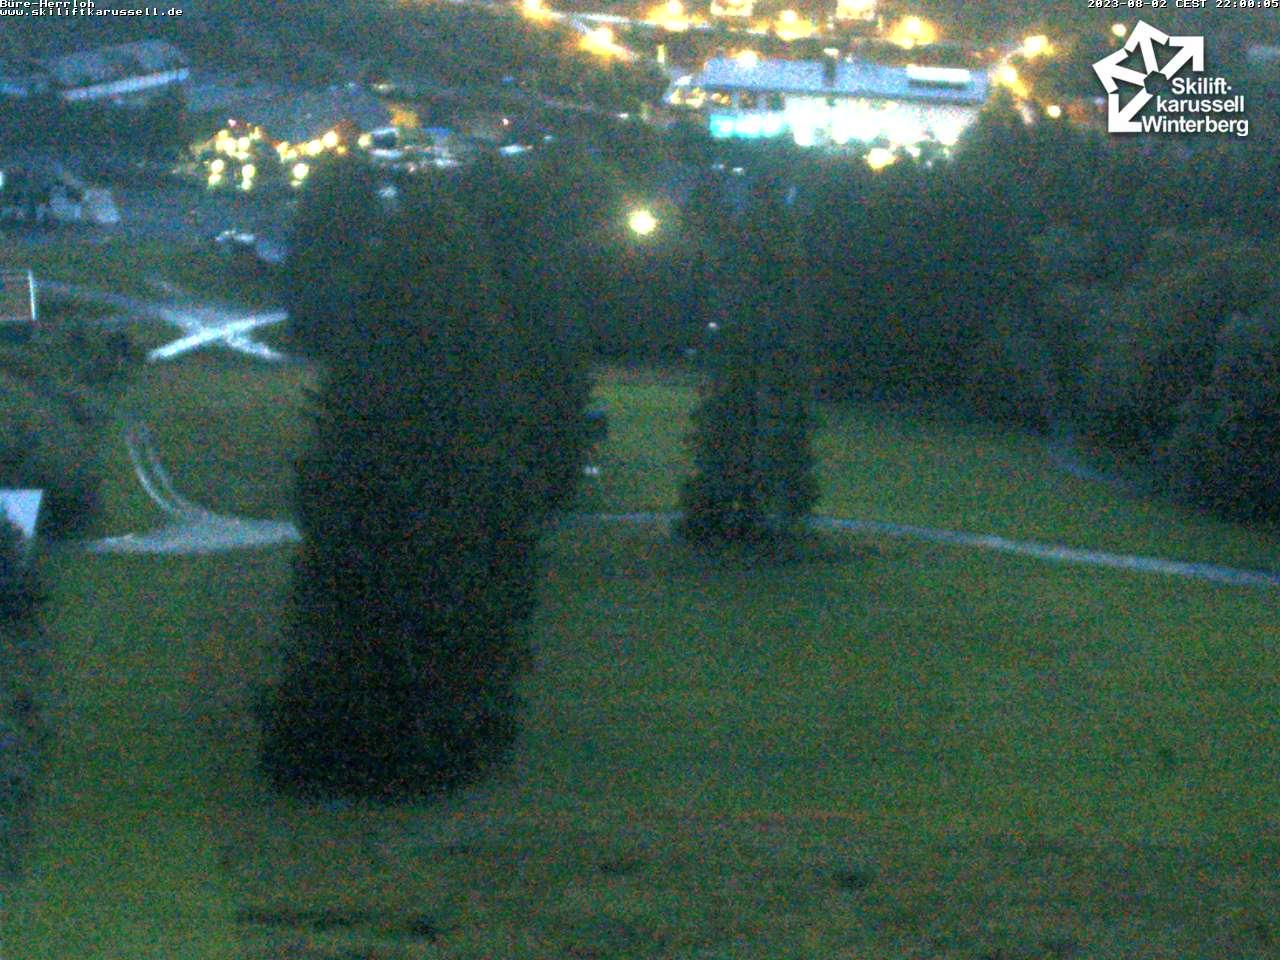 Skiliftkarussell Winterberg - Webcam 5